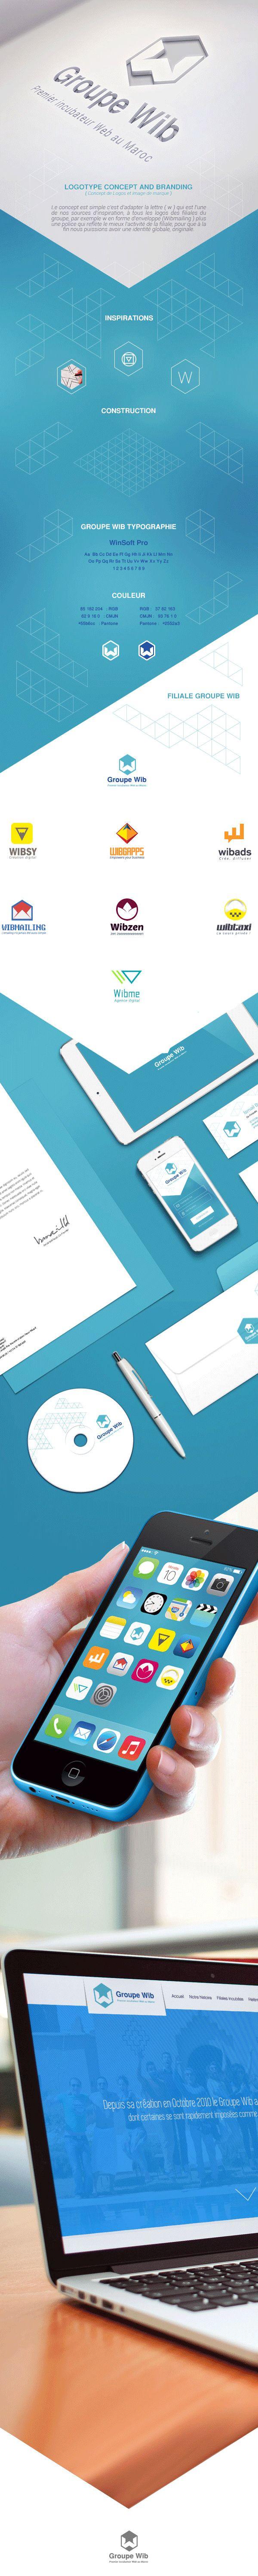 Groupe Wib Branding by Nizar Hassisni, via Behance